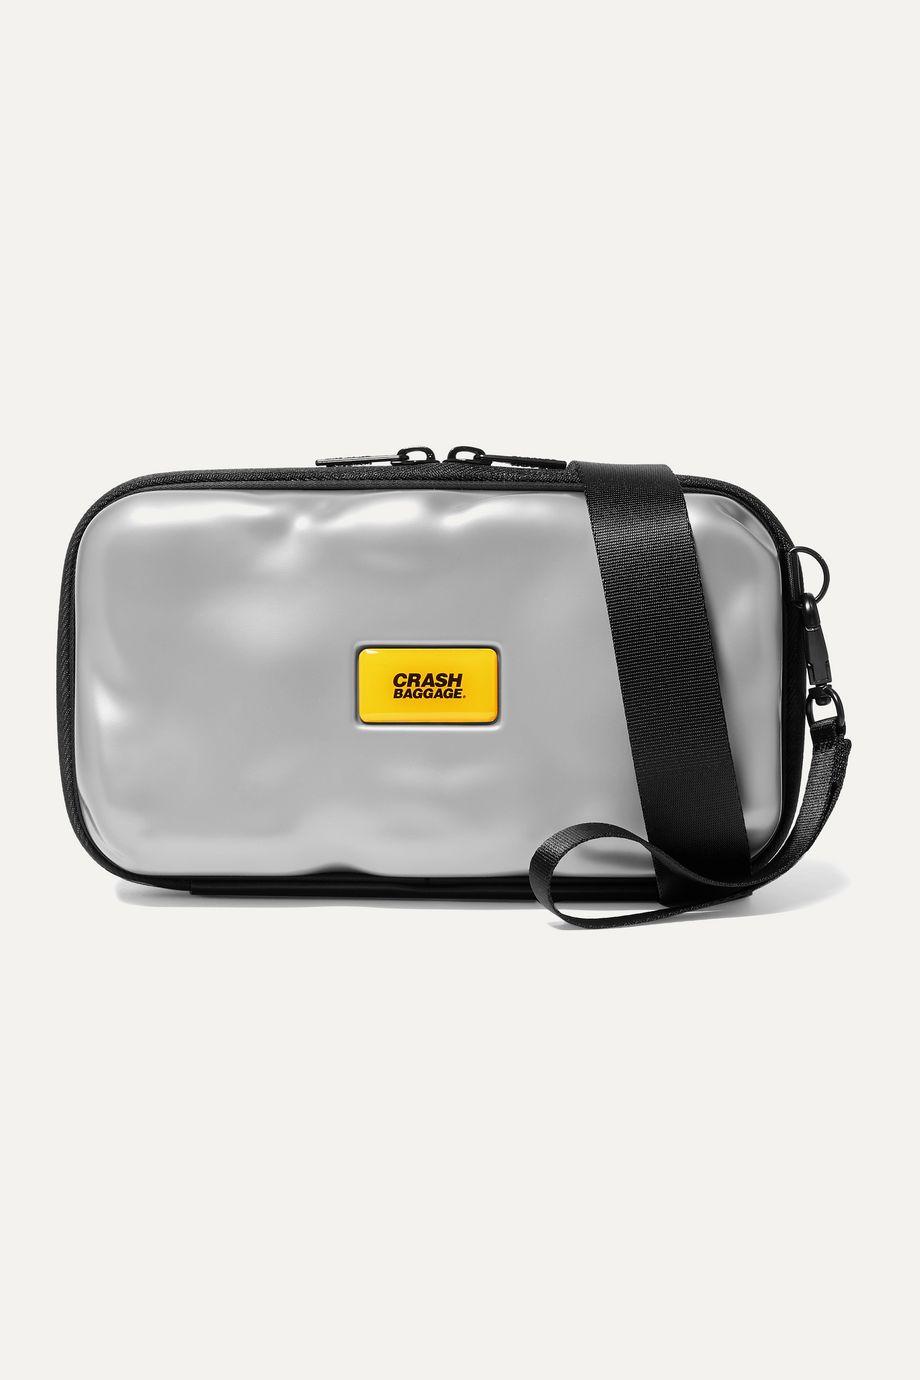 Crash Baggage Icon Mini metallic hardshell pouch